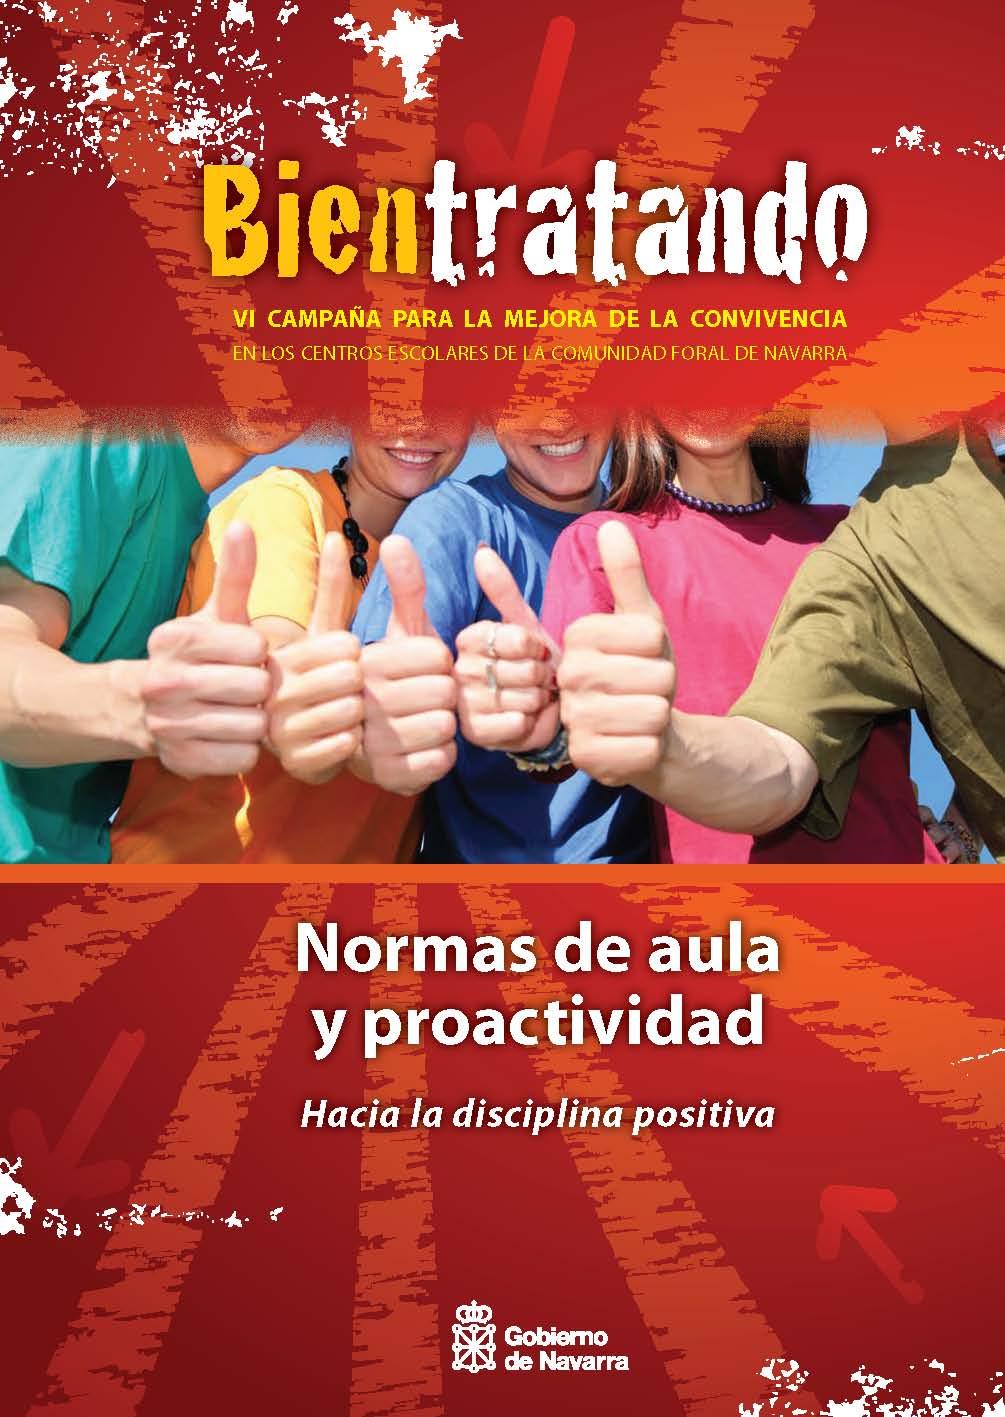 BienTratando País Vasco